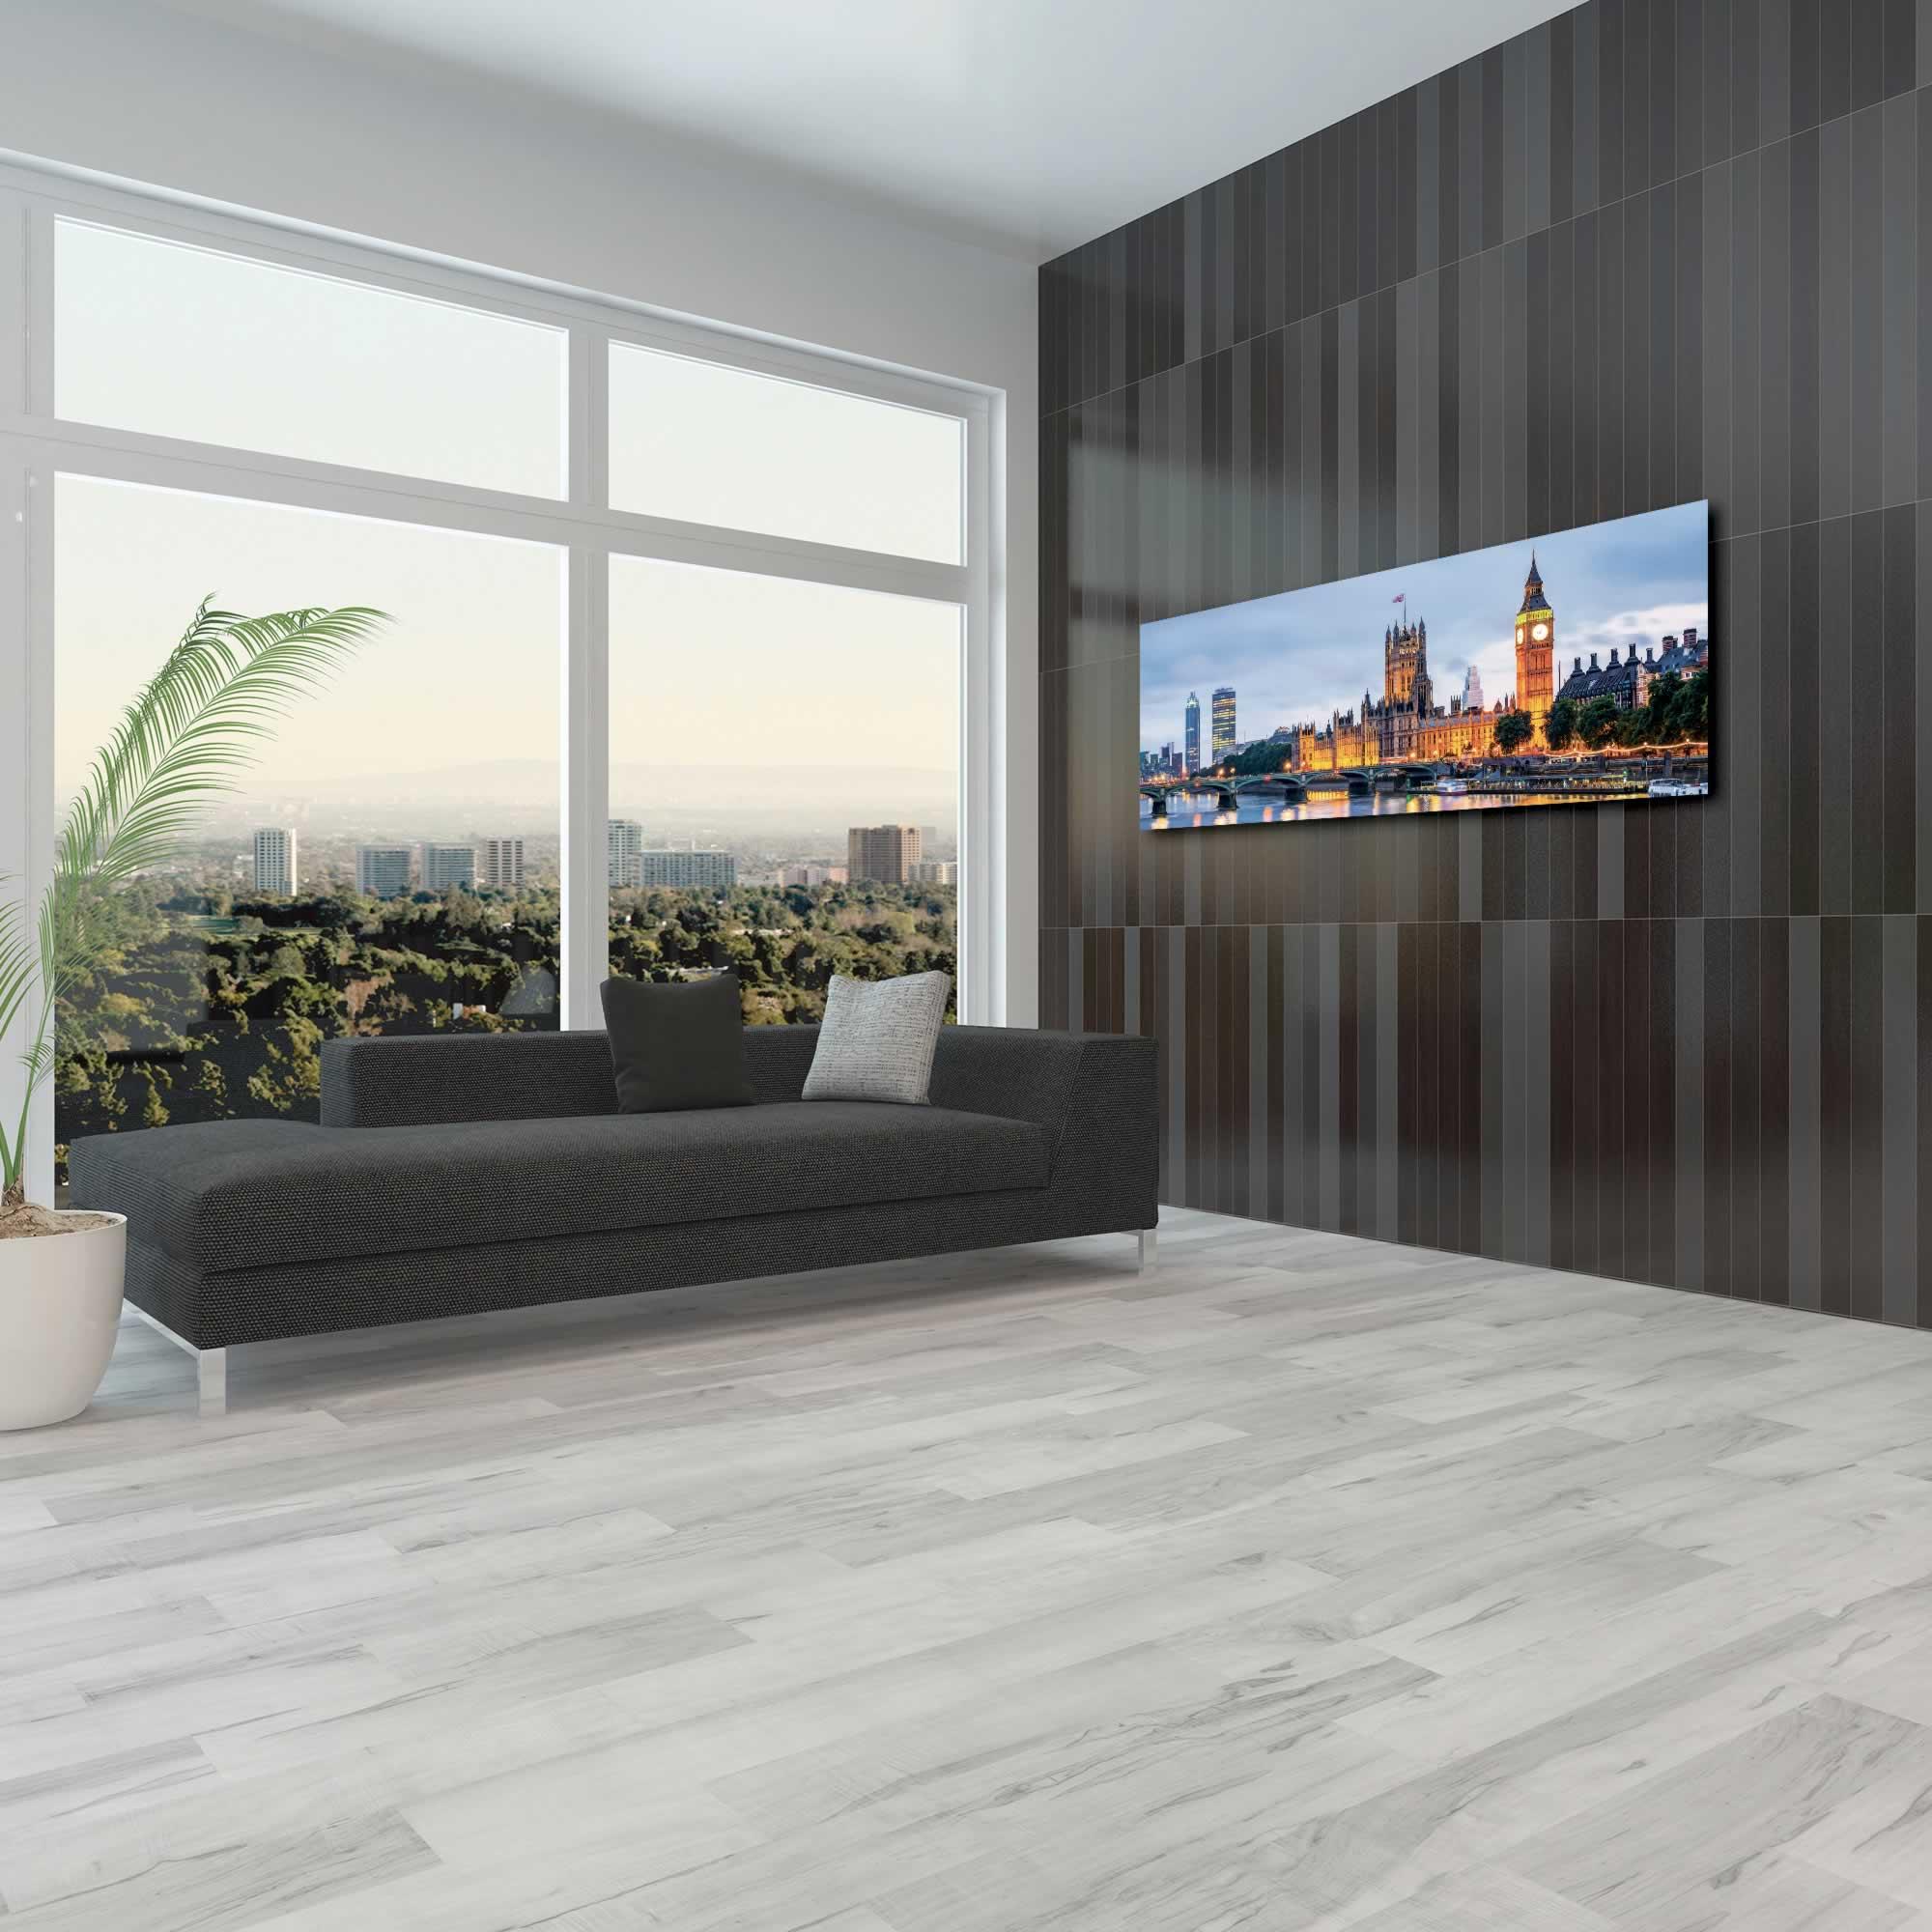 Classic London City Skyline - Urban Modern Art, Designer Home Decor, Cityscape Wall Artwork, Trendy Contemporary Art - Alternate View 3